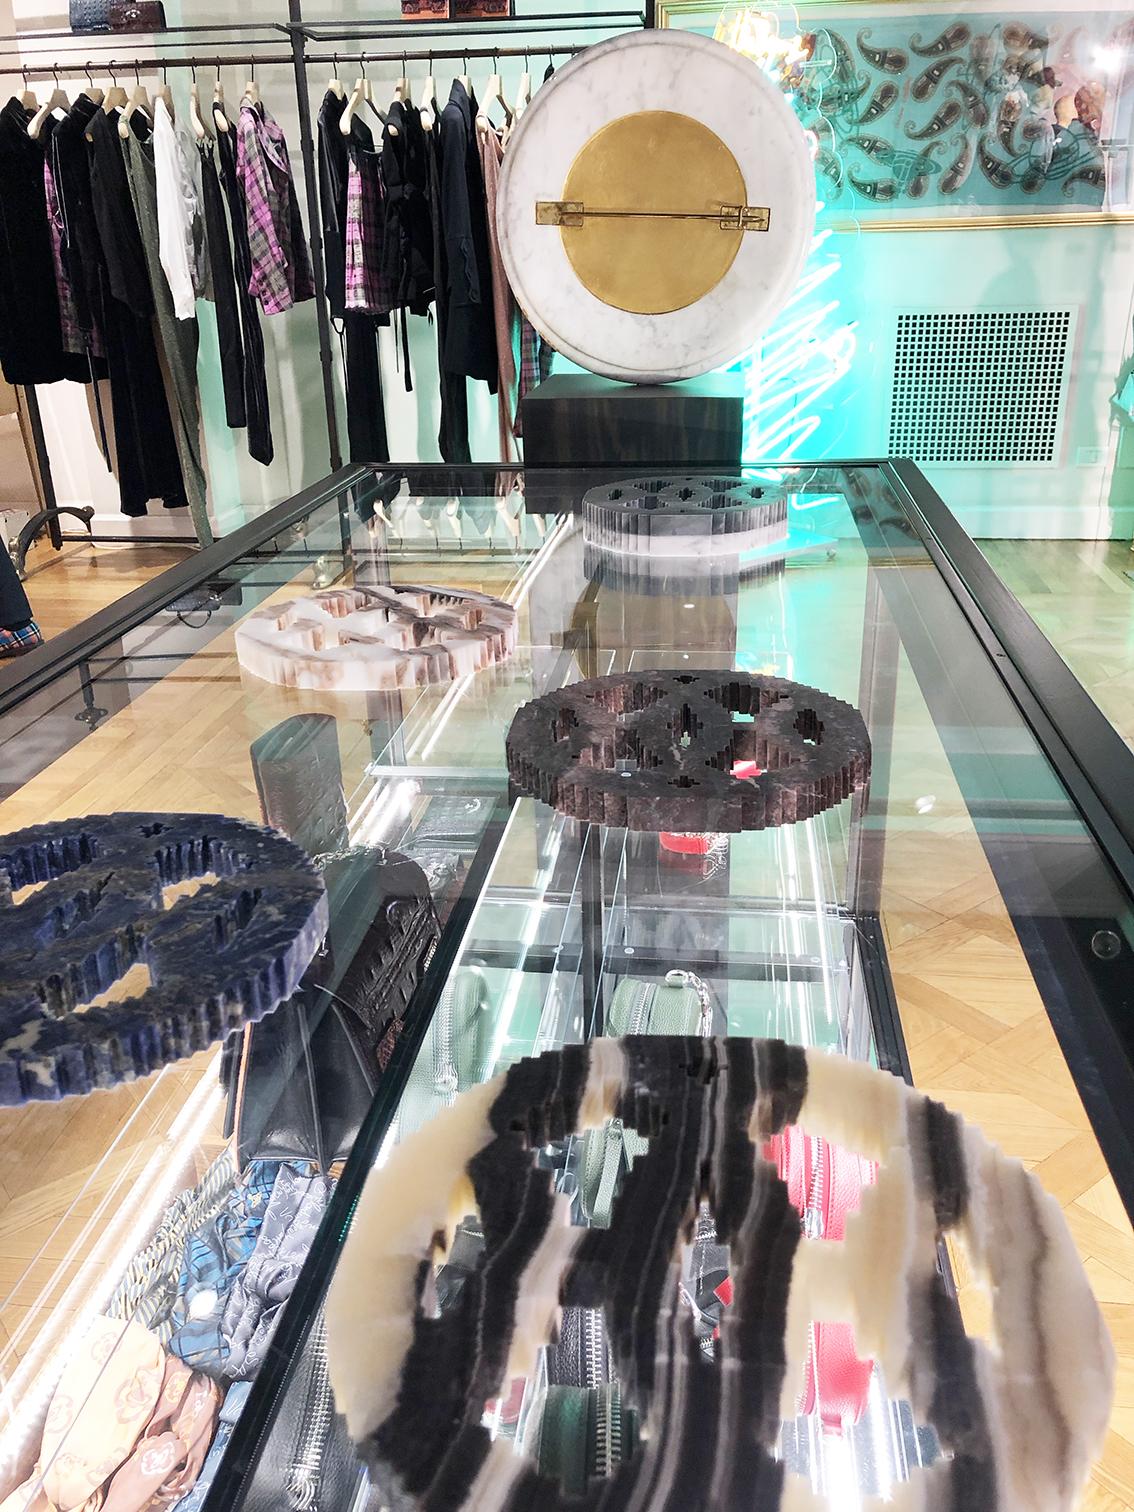 Michele Chiossi scultura JAIPUR H, 2018 marmi policromi labirinto Hermes Vivienne Westwood Milano boutique mostra exhibition ARTYVISME